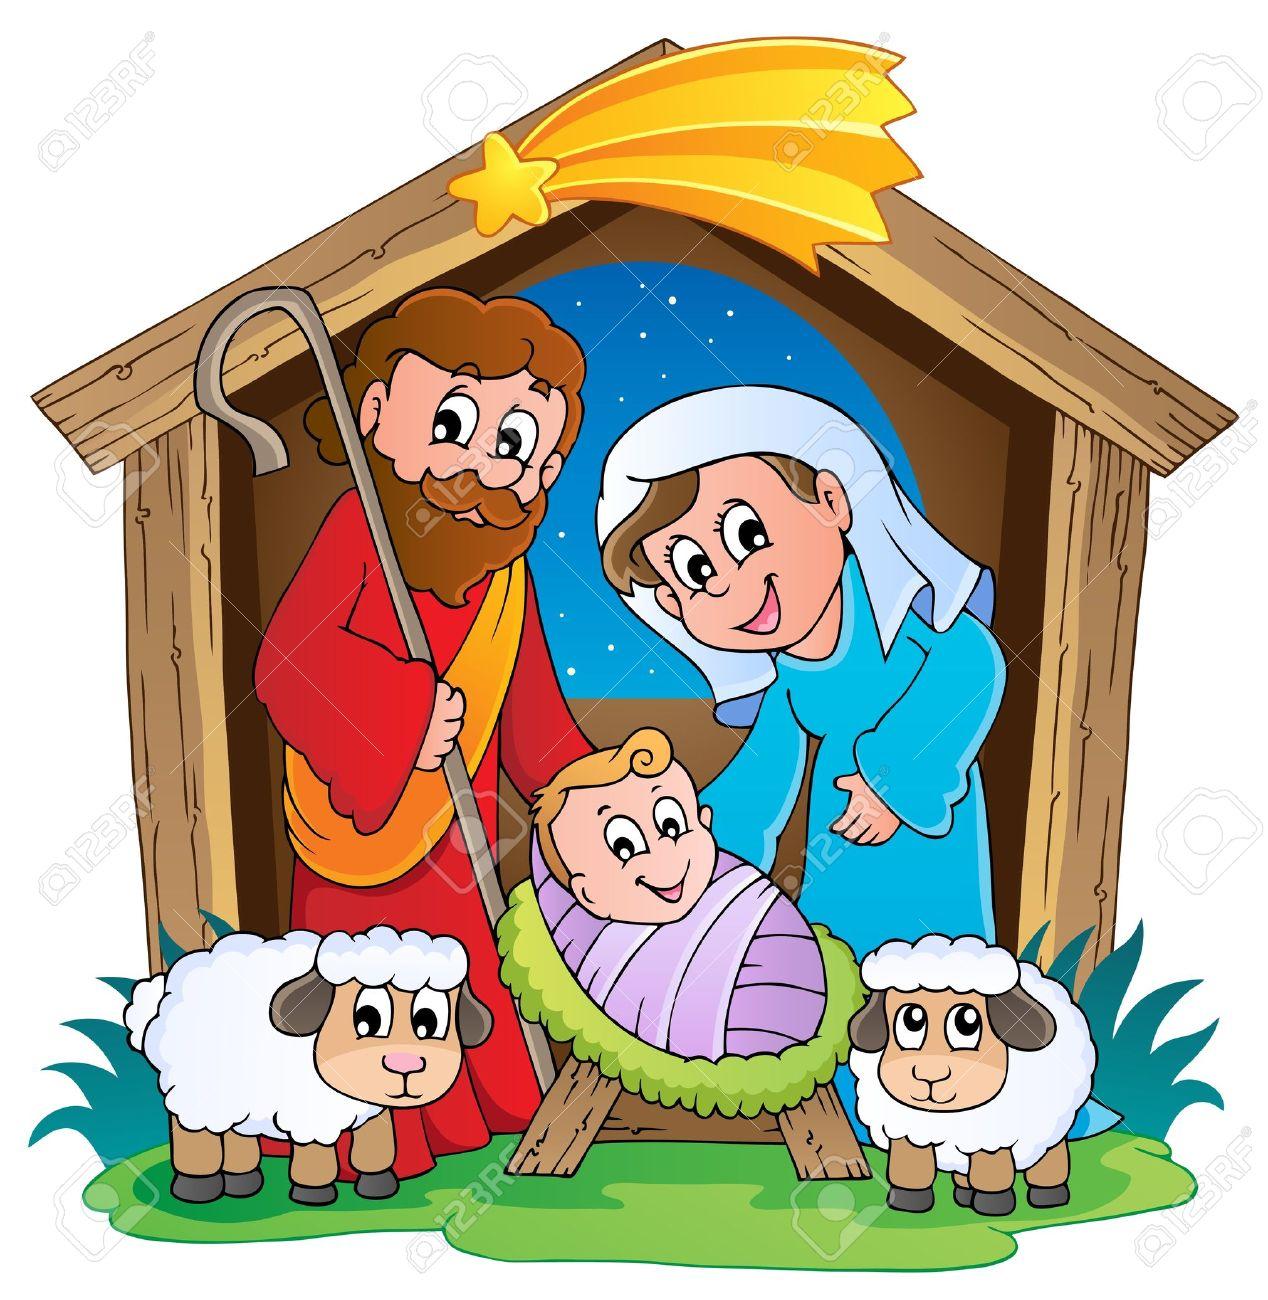 hight resolution of christmas nativity scene 2 stock vector 16272971